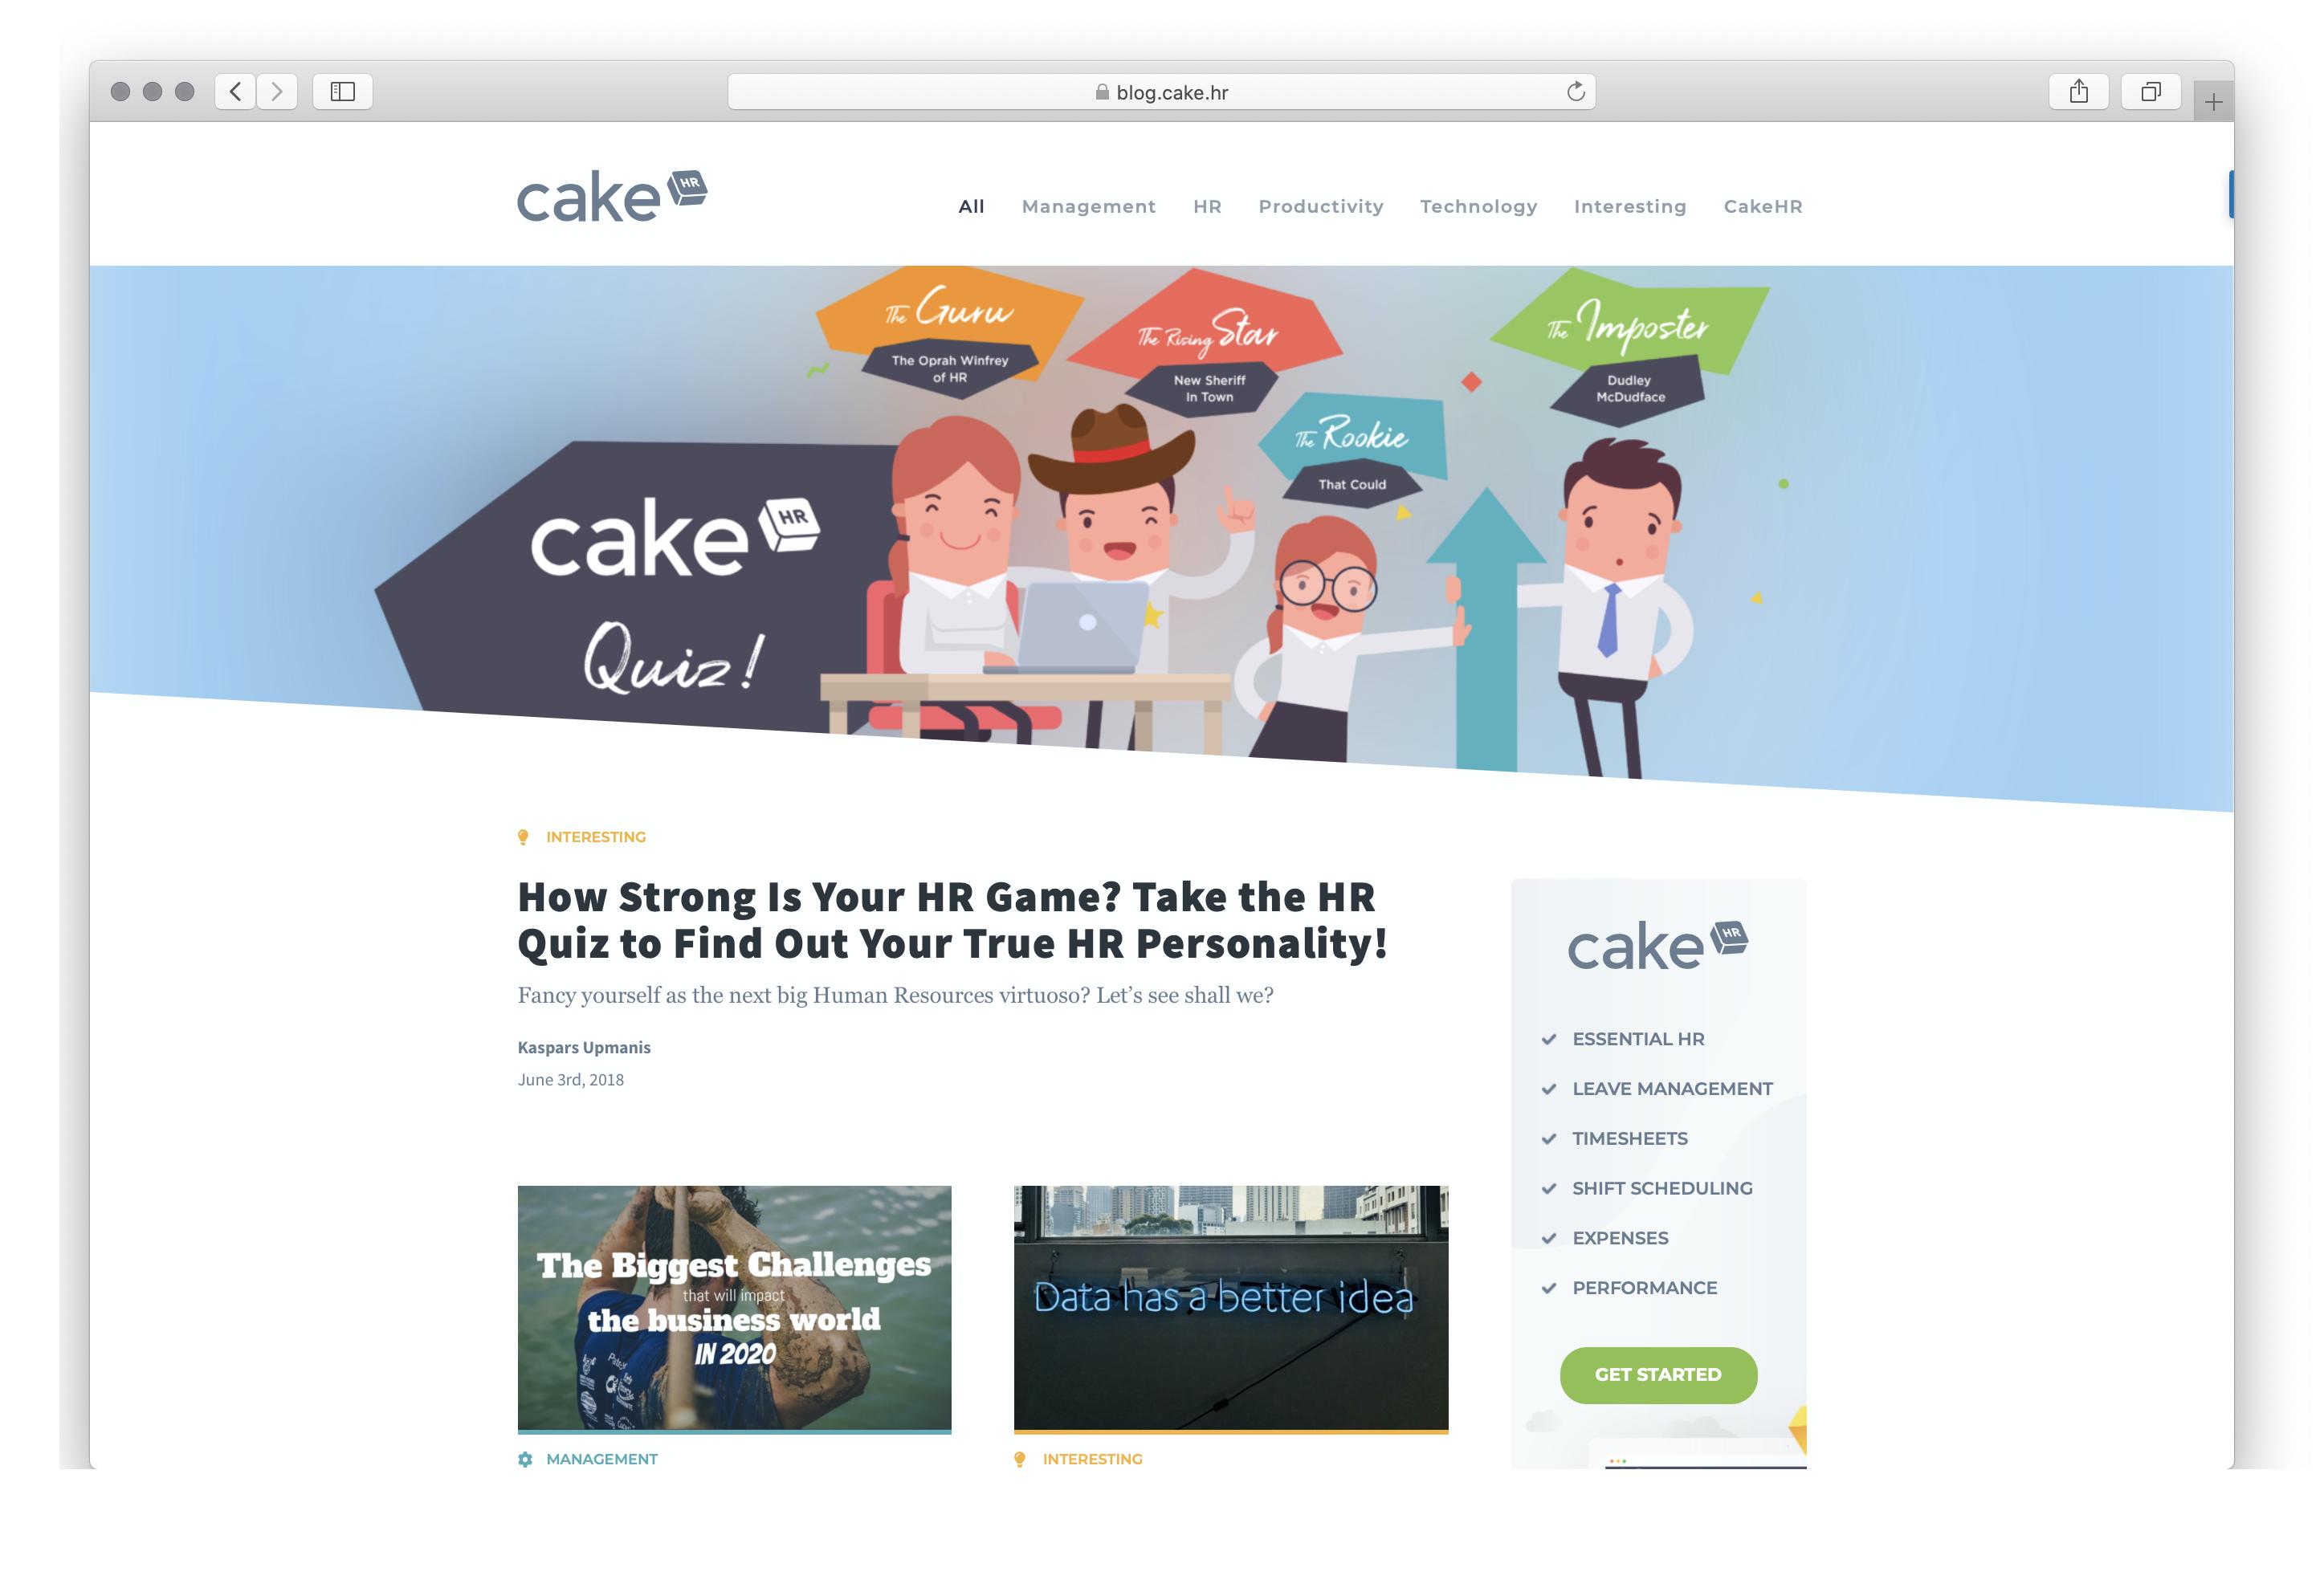 Best Blogs for Human Resource Management: CakeHR